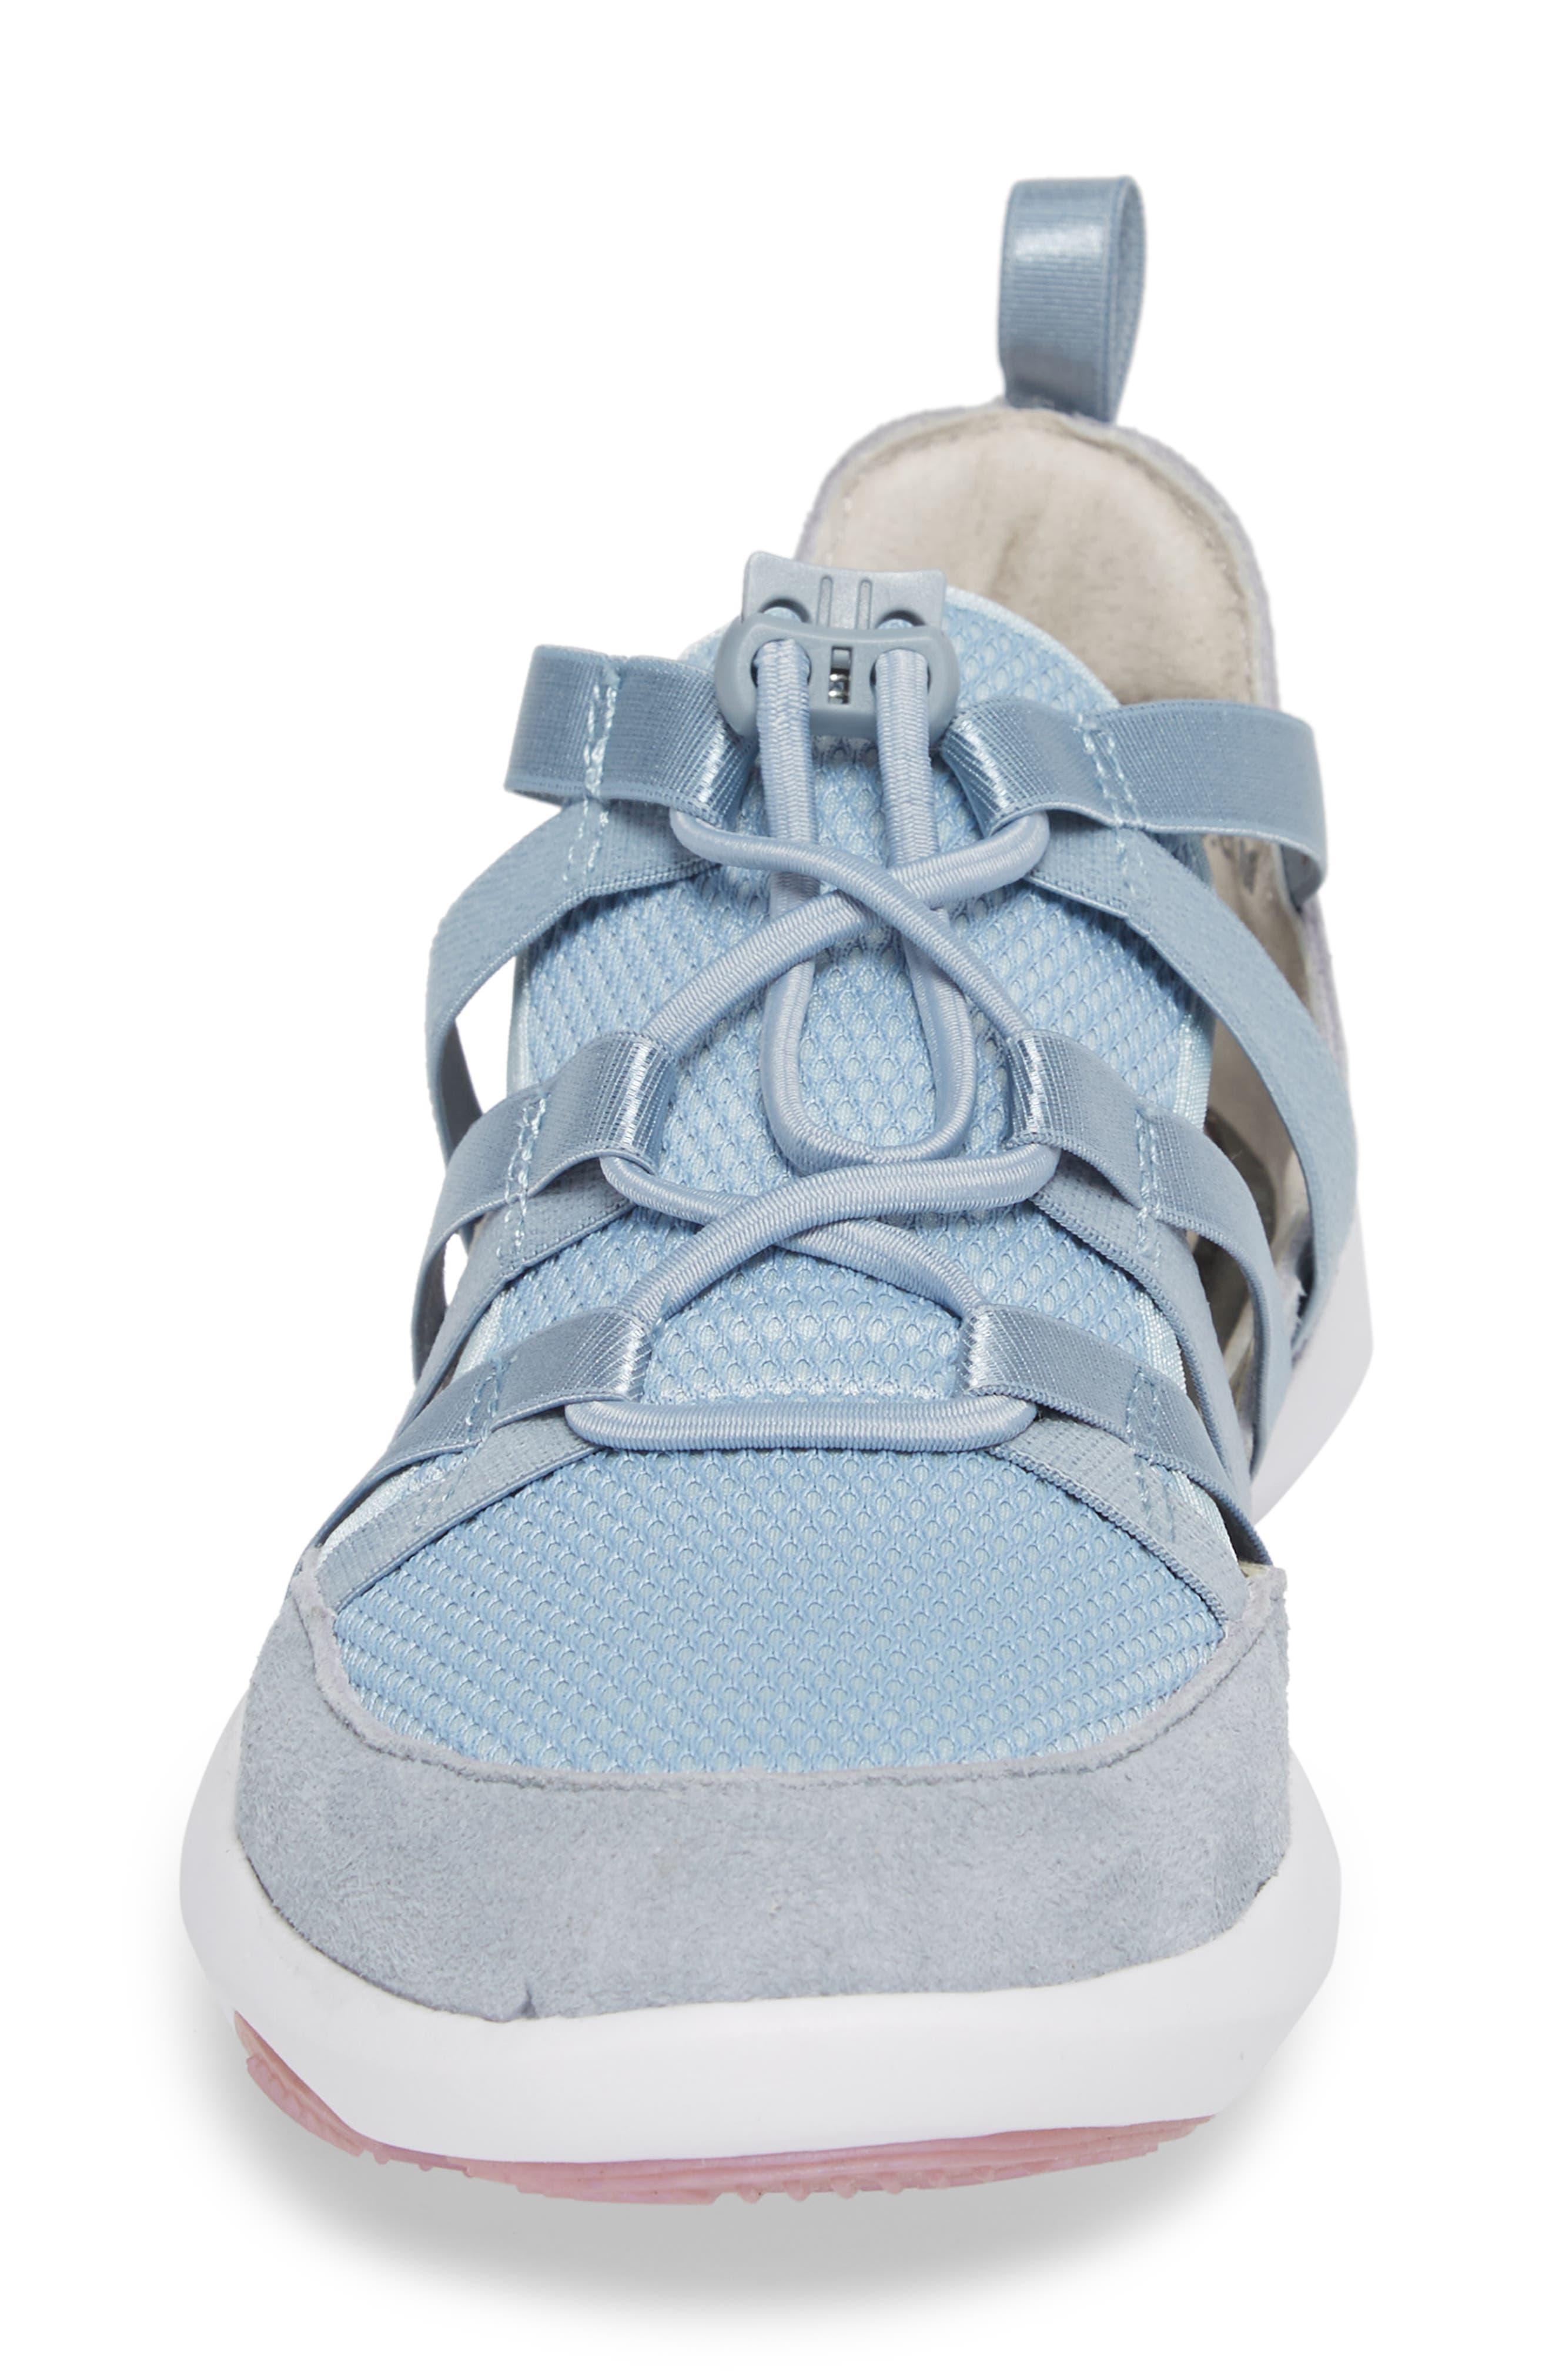 Azalea Sneaker,                             Alternate thumbnail 4, color,                             BLUE LEATHER